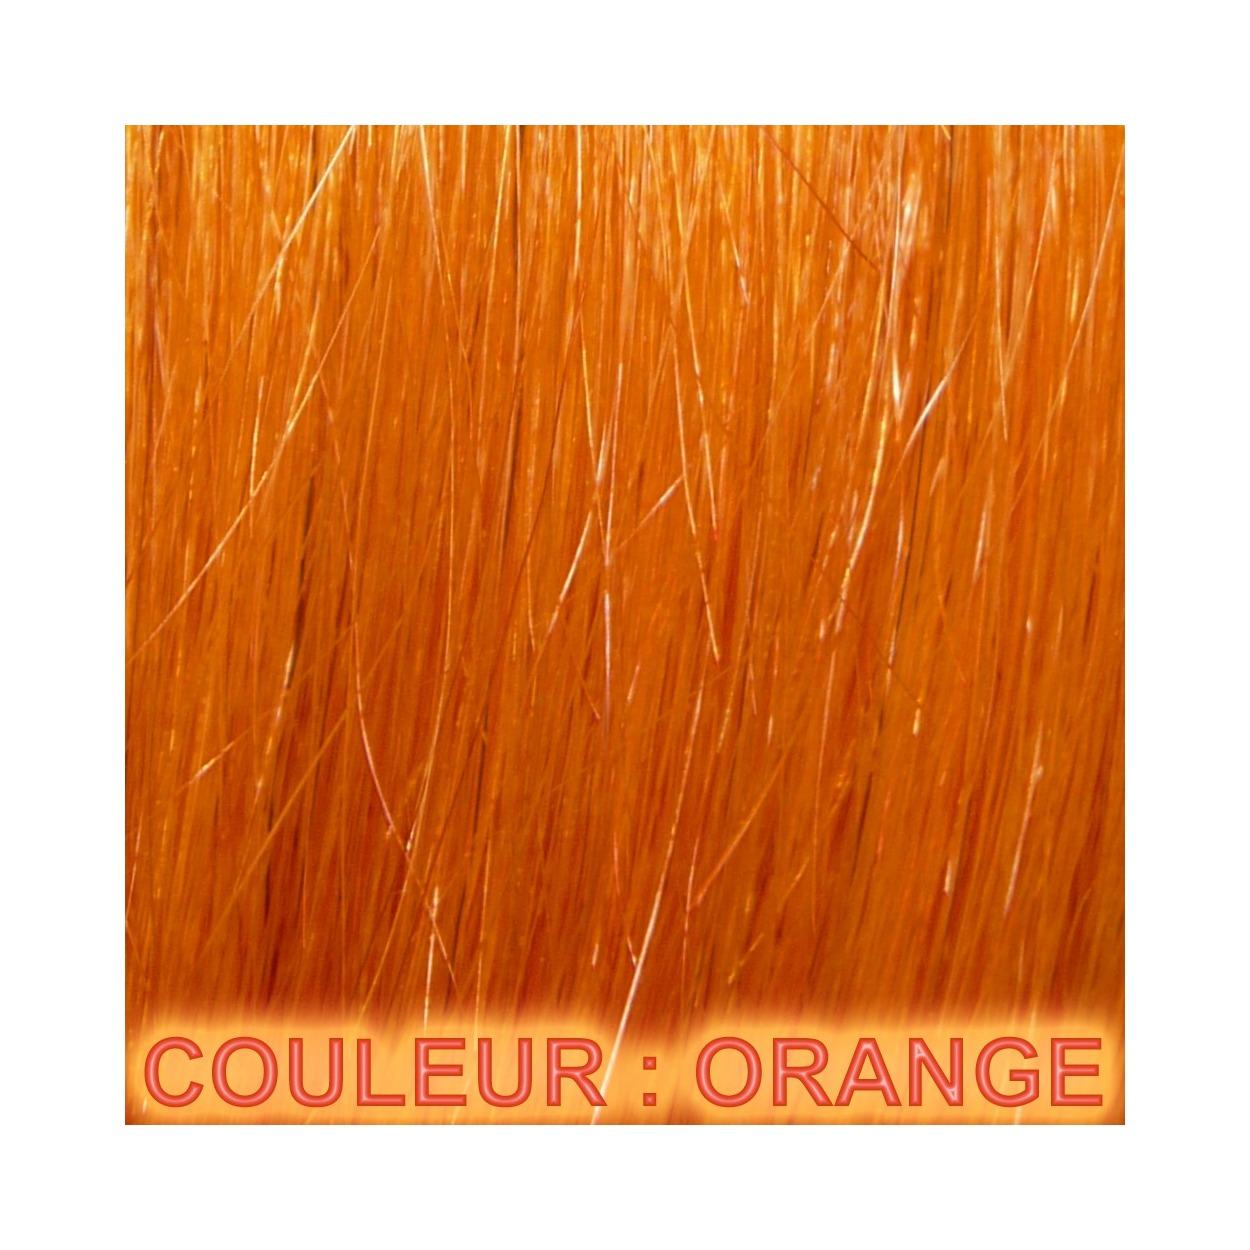 prixcanon lot de 200 extensions cheveux remy pose a chaud 100 naturels. Black Bedroom Furniture Sets. Home Design Ideas